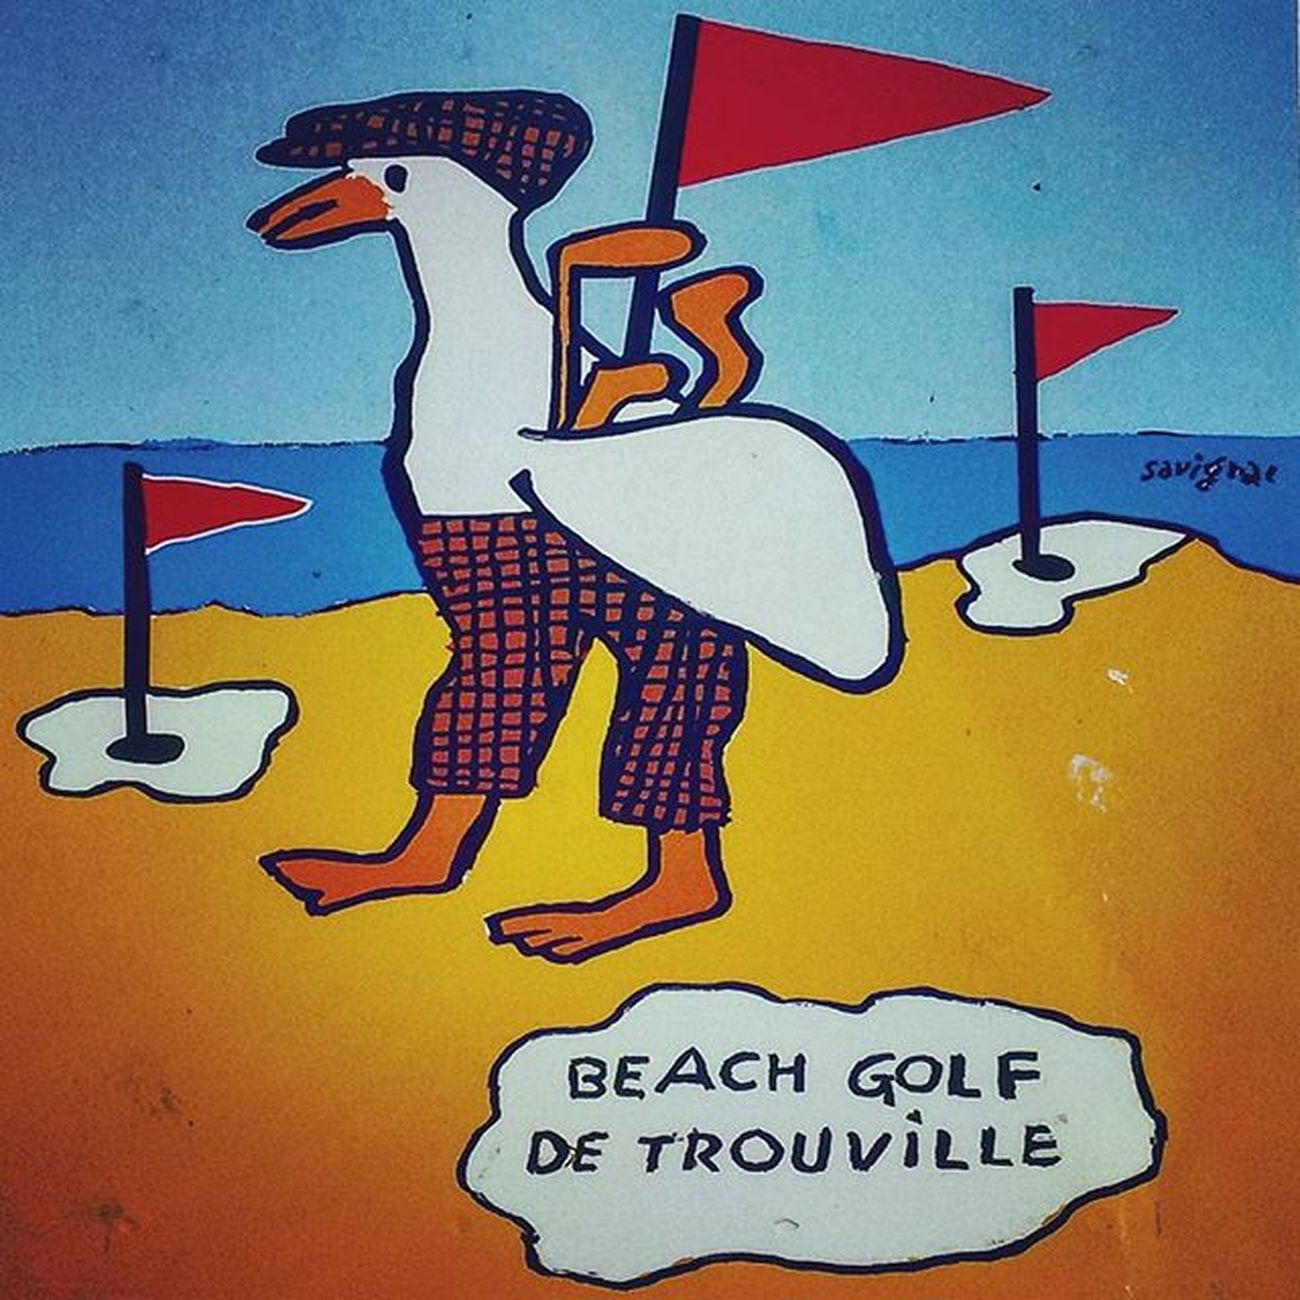 Beach Golf Nikonfr Igersfrance IgersNormandie Normandie Normandy Beach Golf Savignac Deauville Trouville Sun Plage Picsoftheday Coeurpostal Animal Goeland Topfrancephoto Putaseagullonit Seagull Seagulls